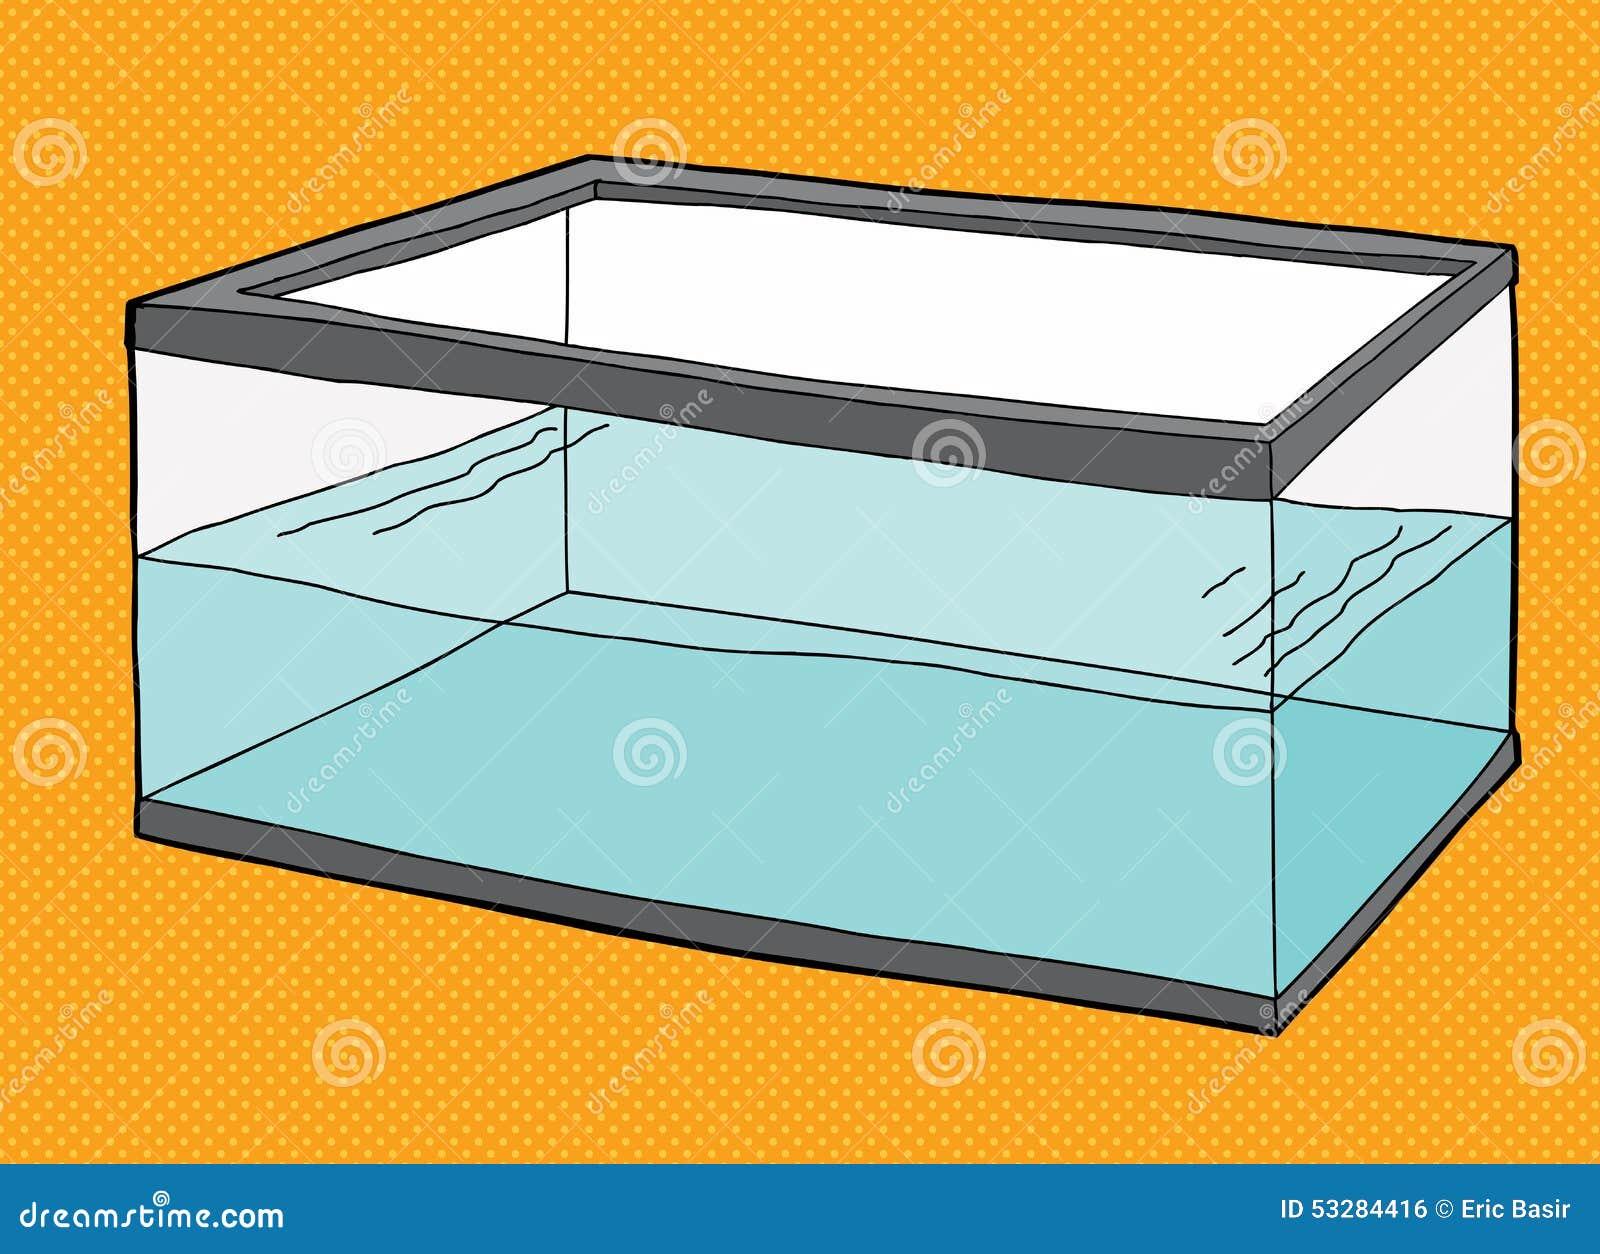 Fish tank clipart - Half Full Fish Tank Royalty Free Stock Image